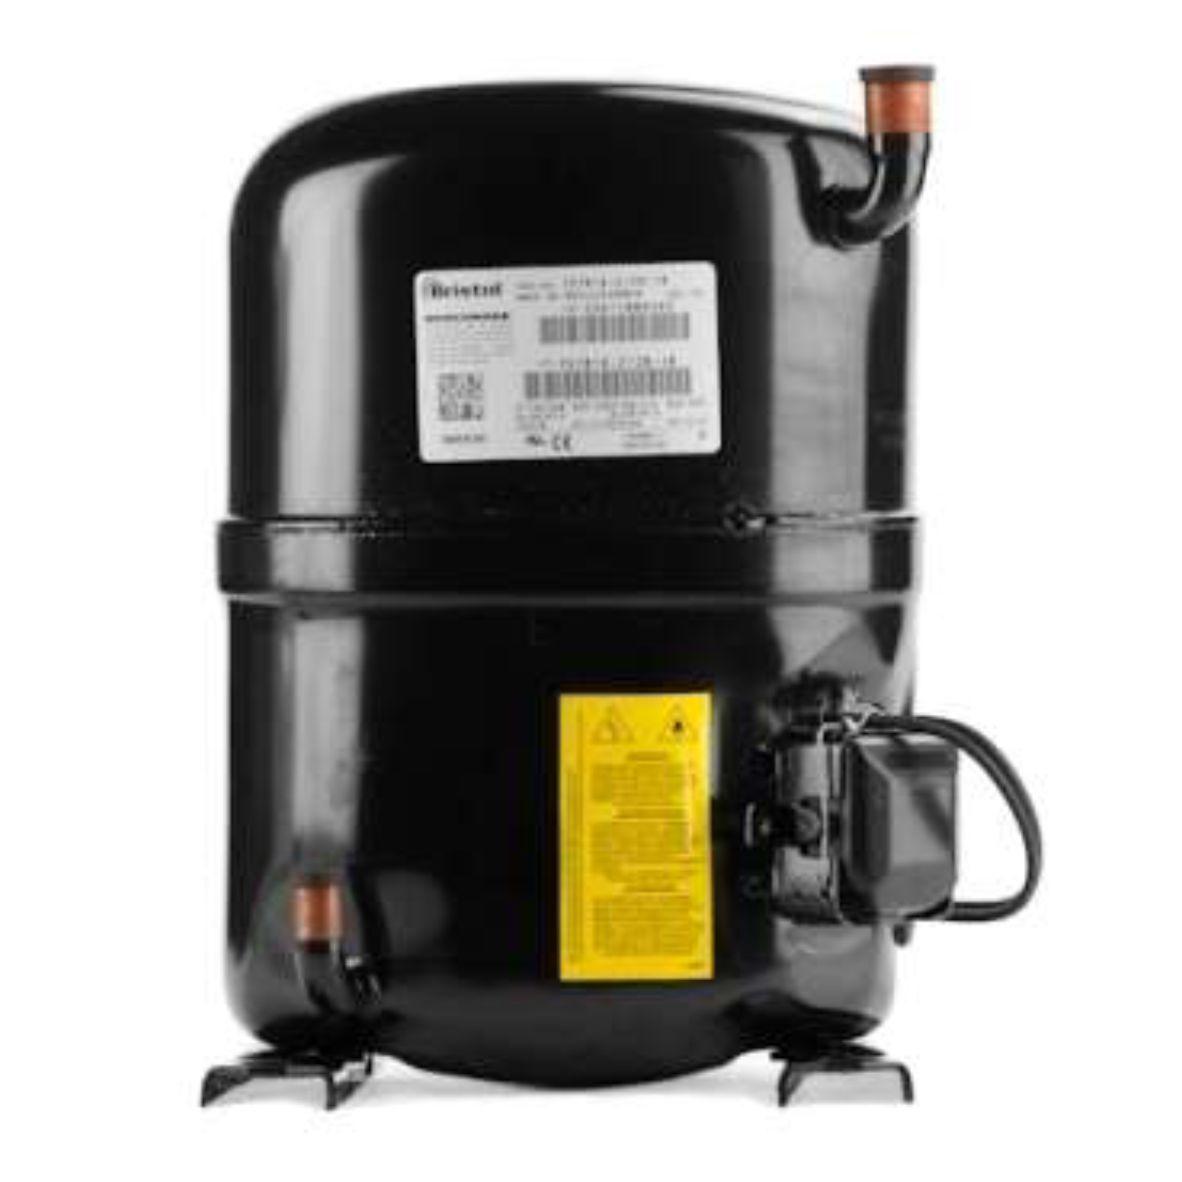 Compressor Bristol 2.1/2 HP Trifásico 220V H29B30UDBLA R22